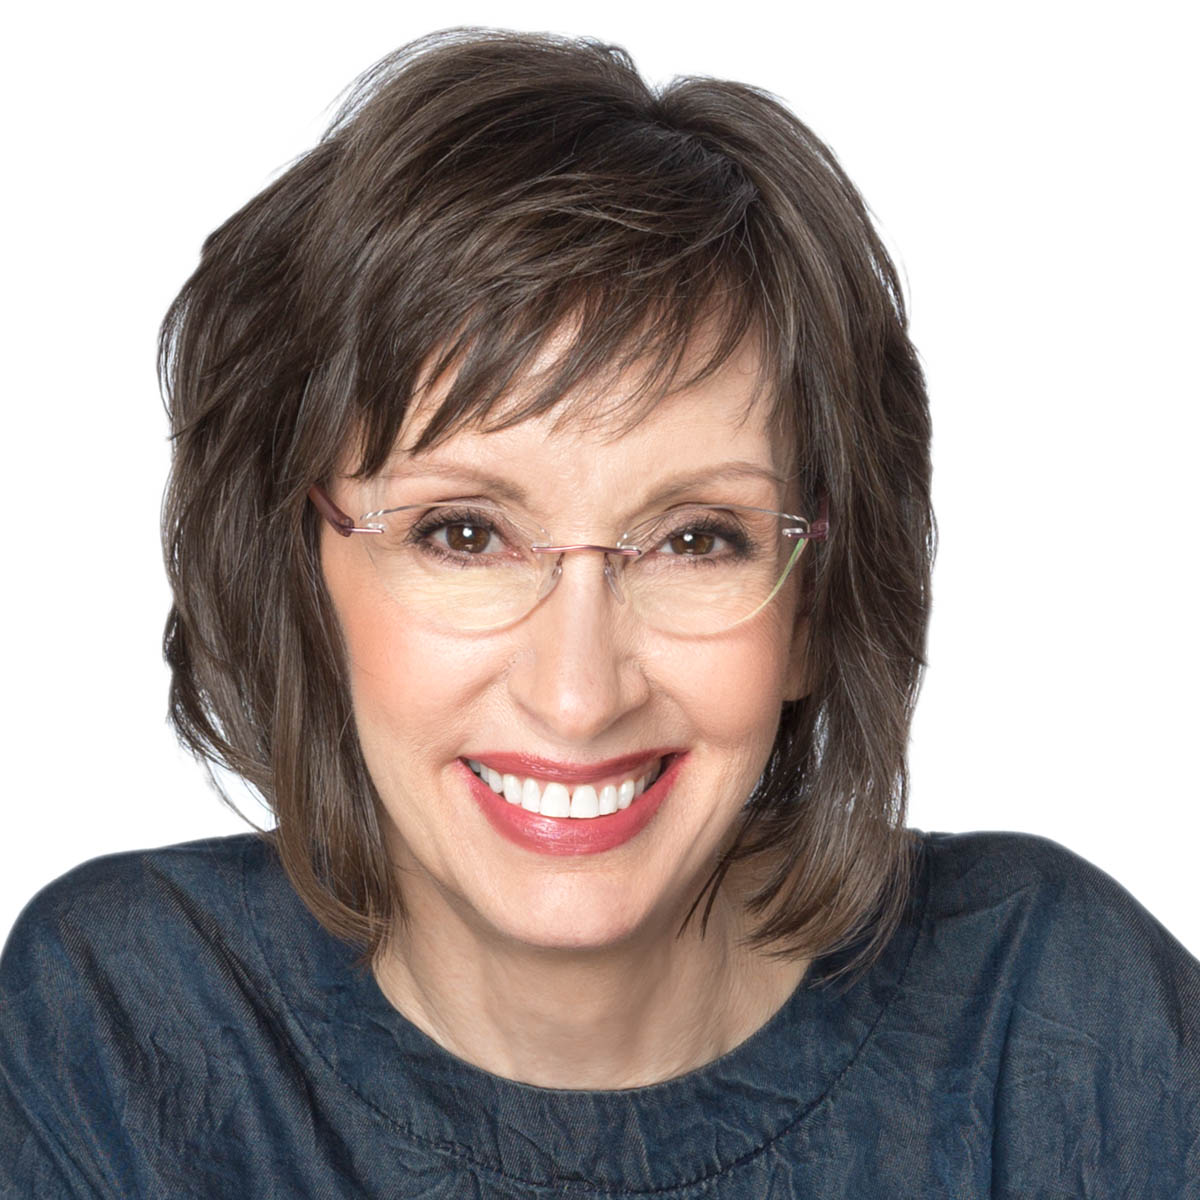 Karen Snow